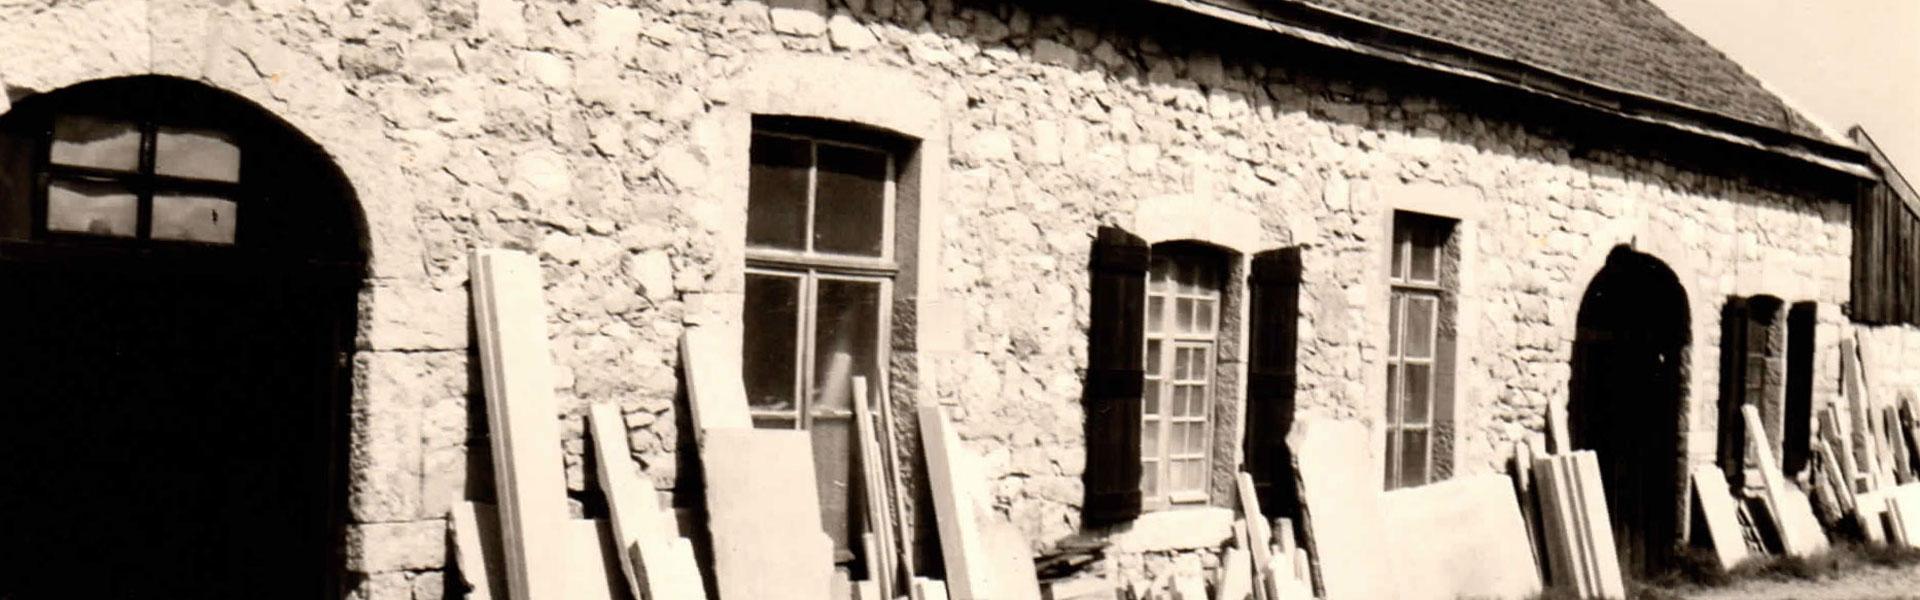 Jahr-1969-Gebaeude_3_3_Web_1920x600